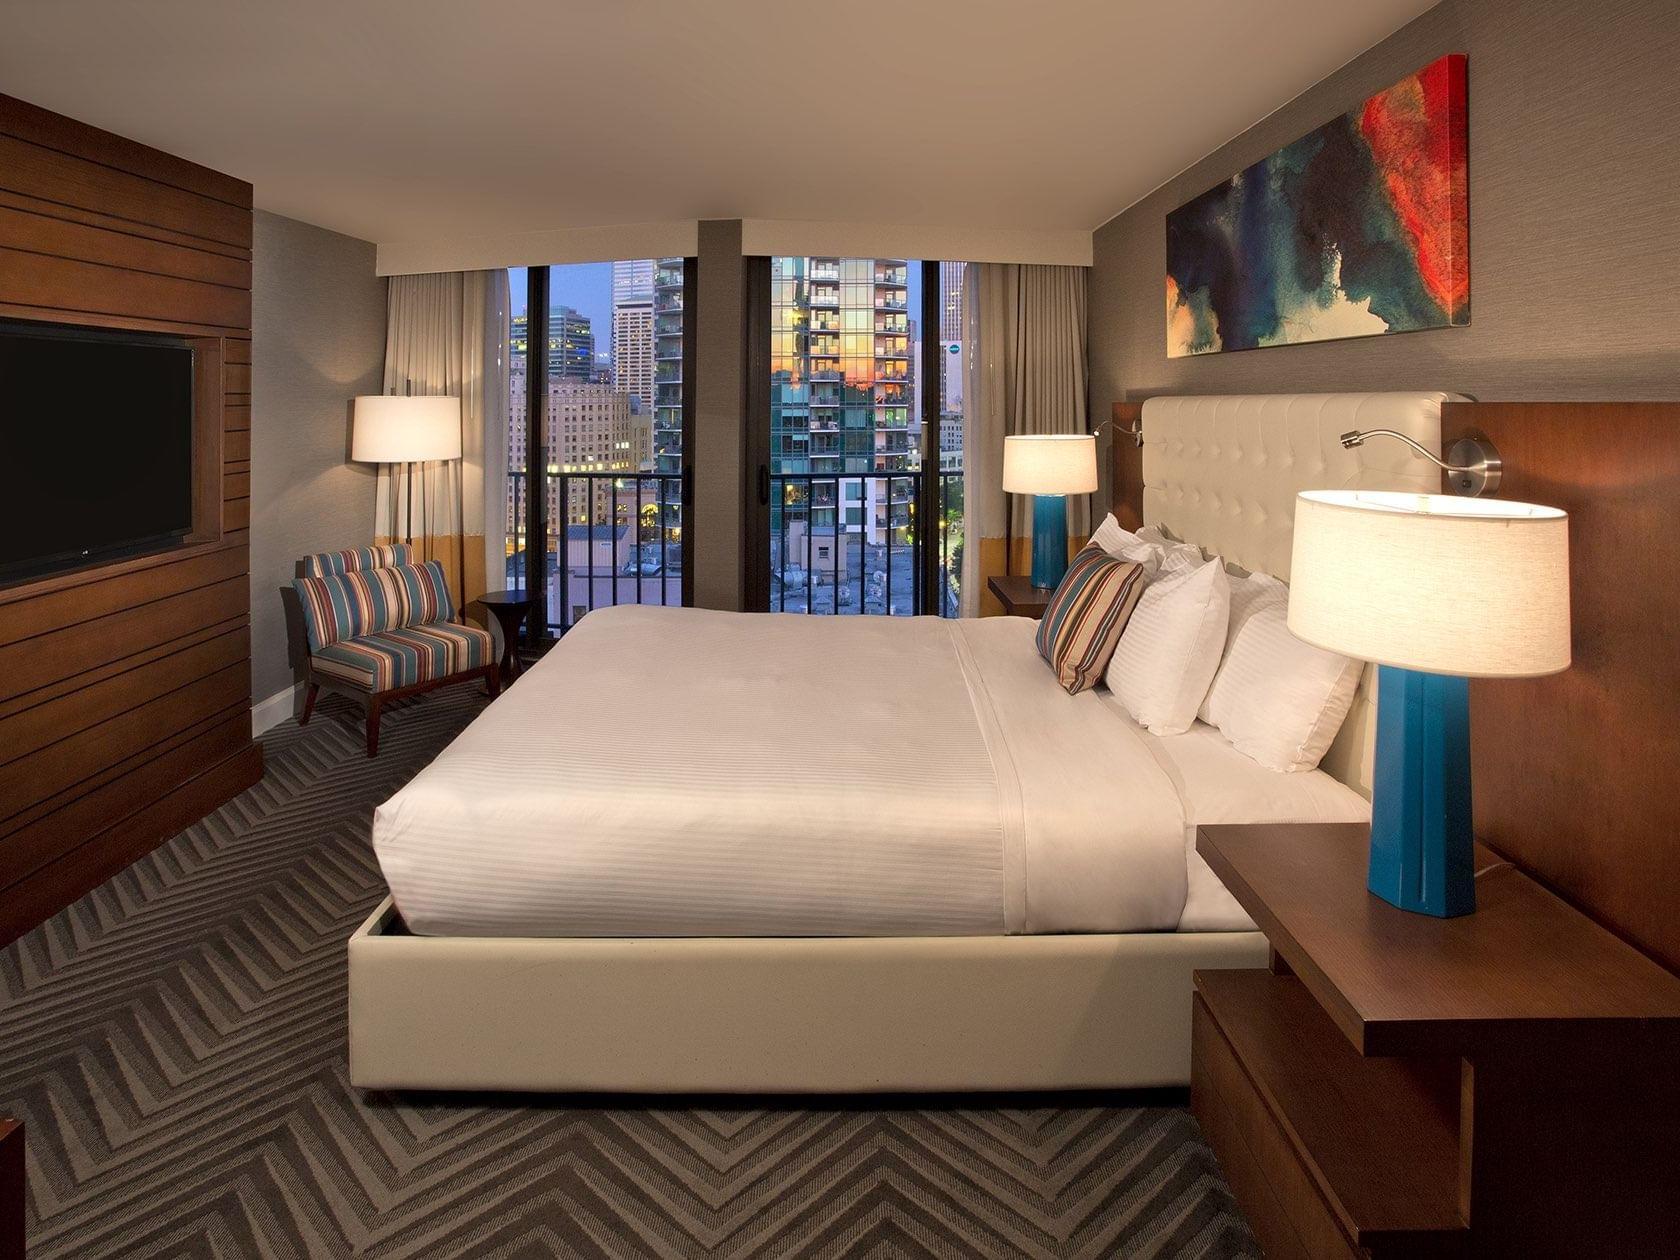 Evergreen Suite Bedroom at Warwick Seattle